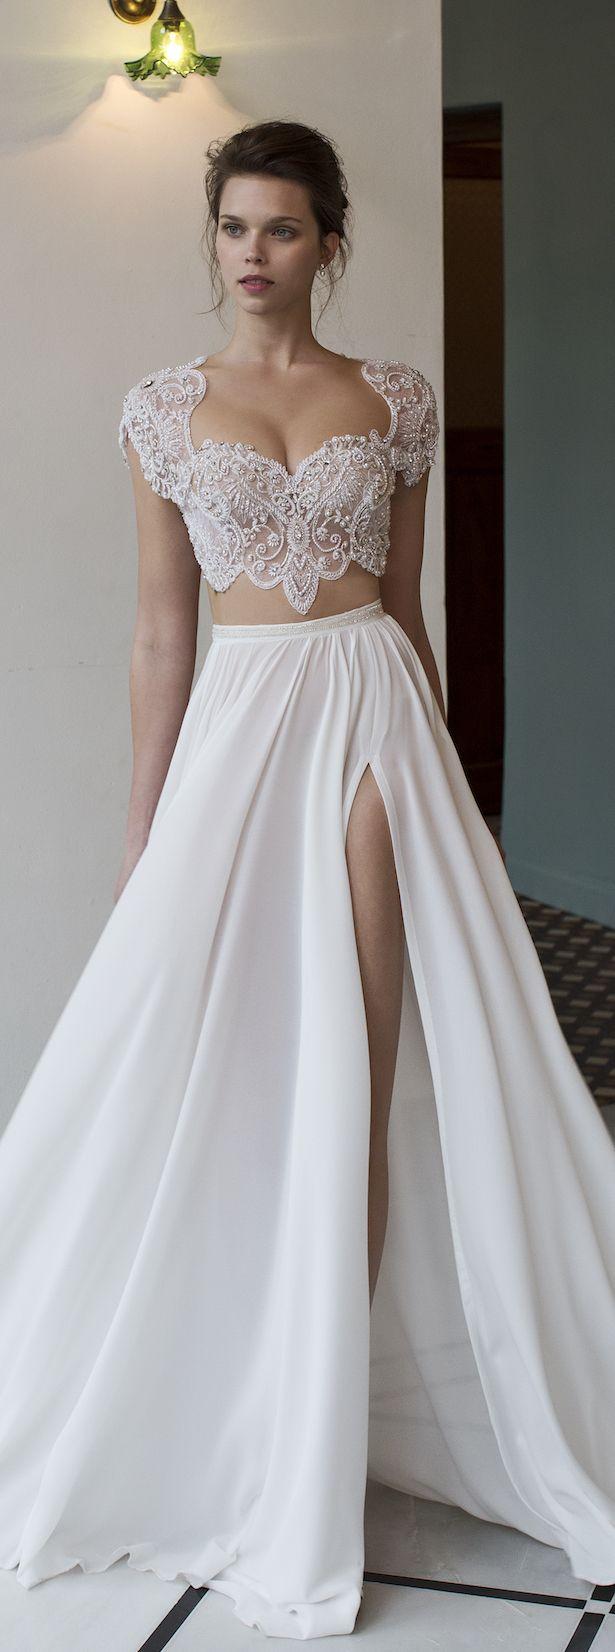 conservative wedding dress tank top wedding dresses Bridal Trends Two Piece Wedding Dresses